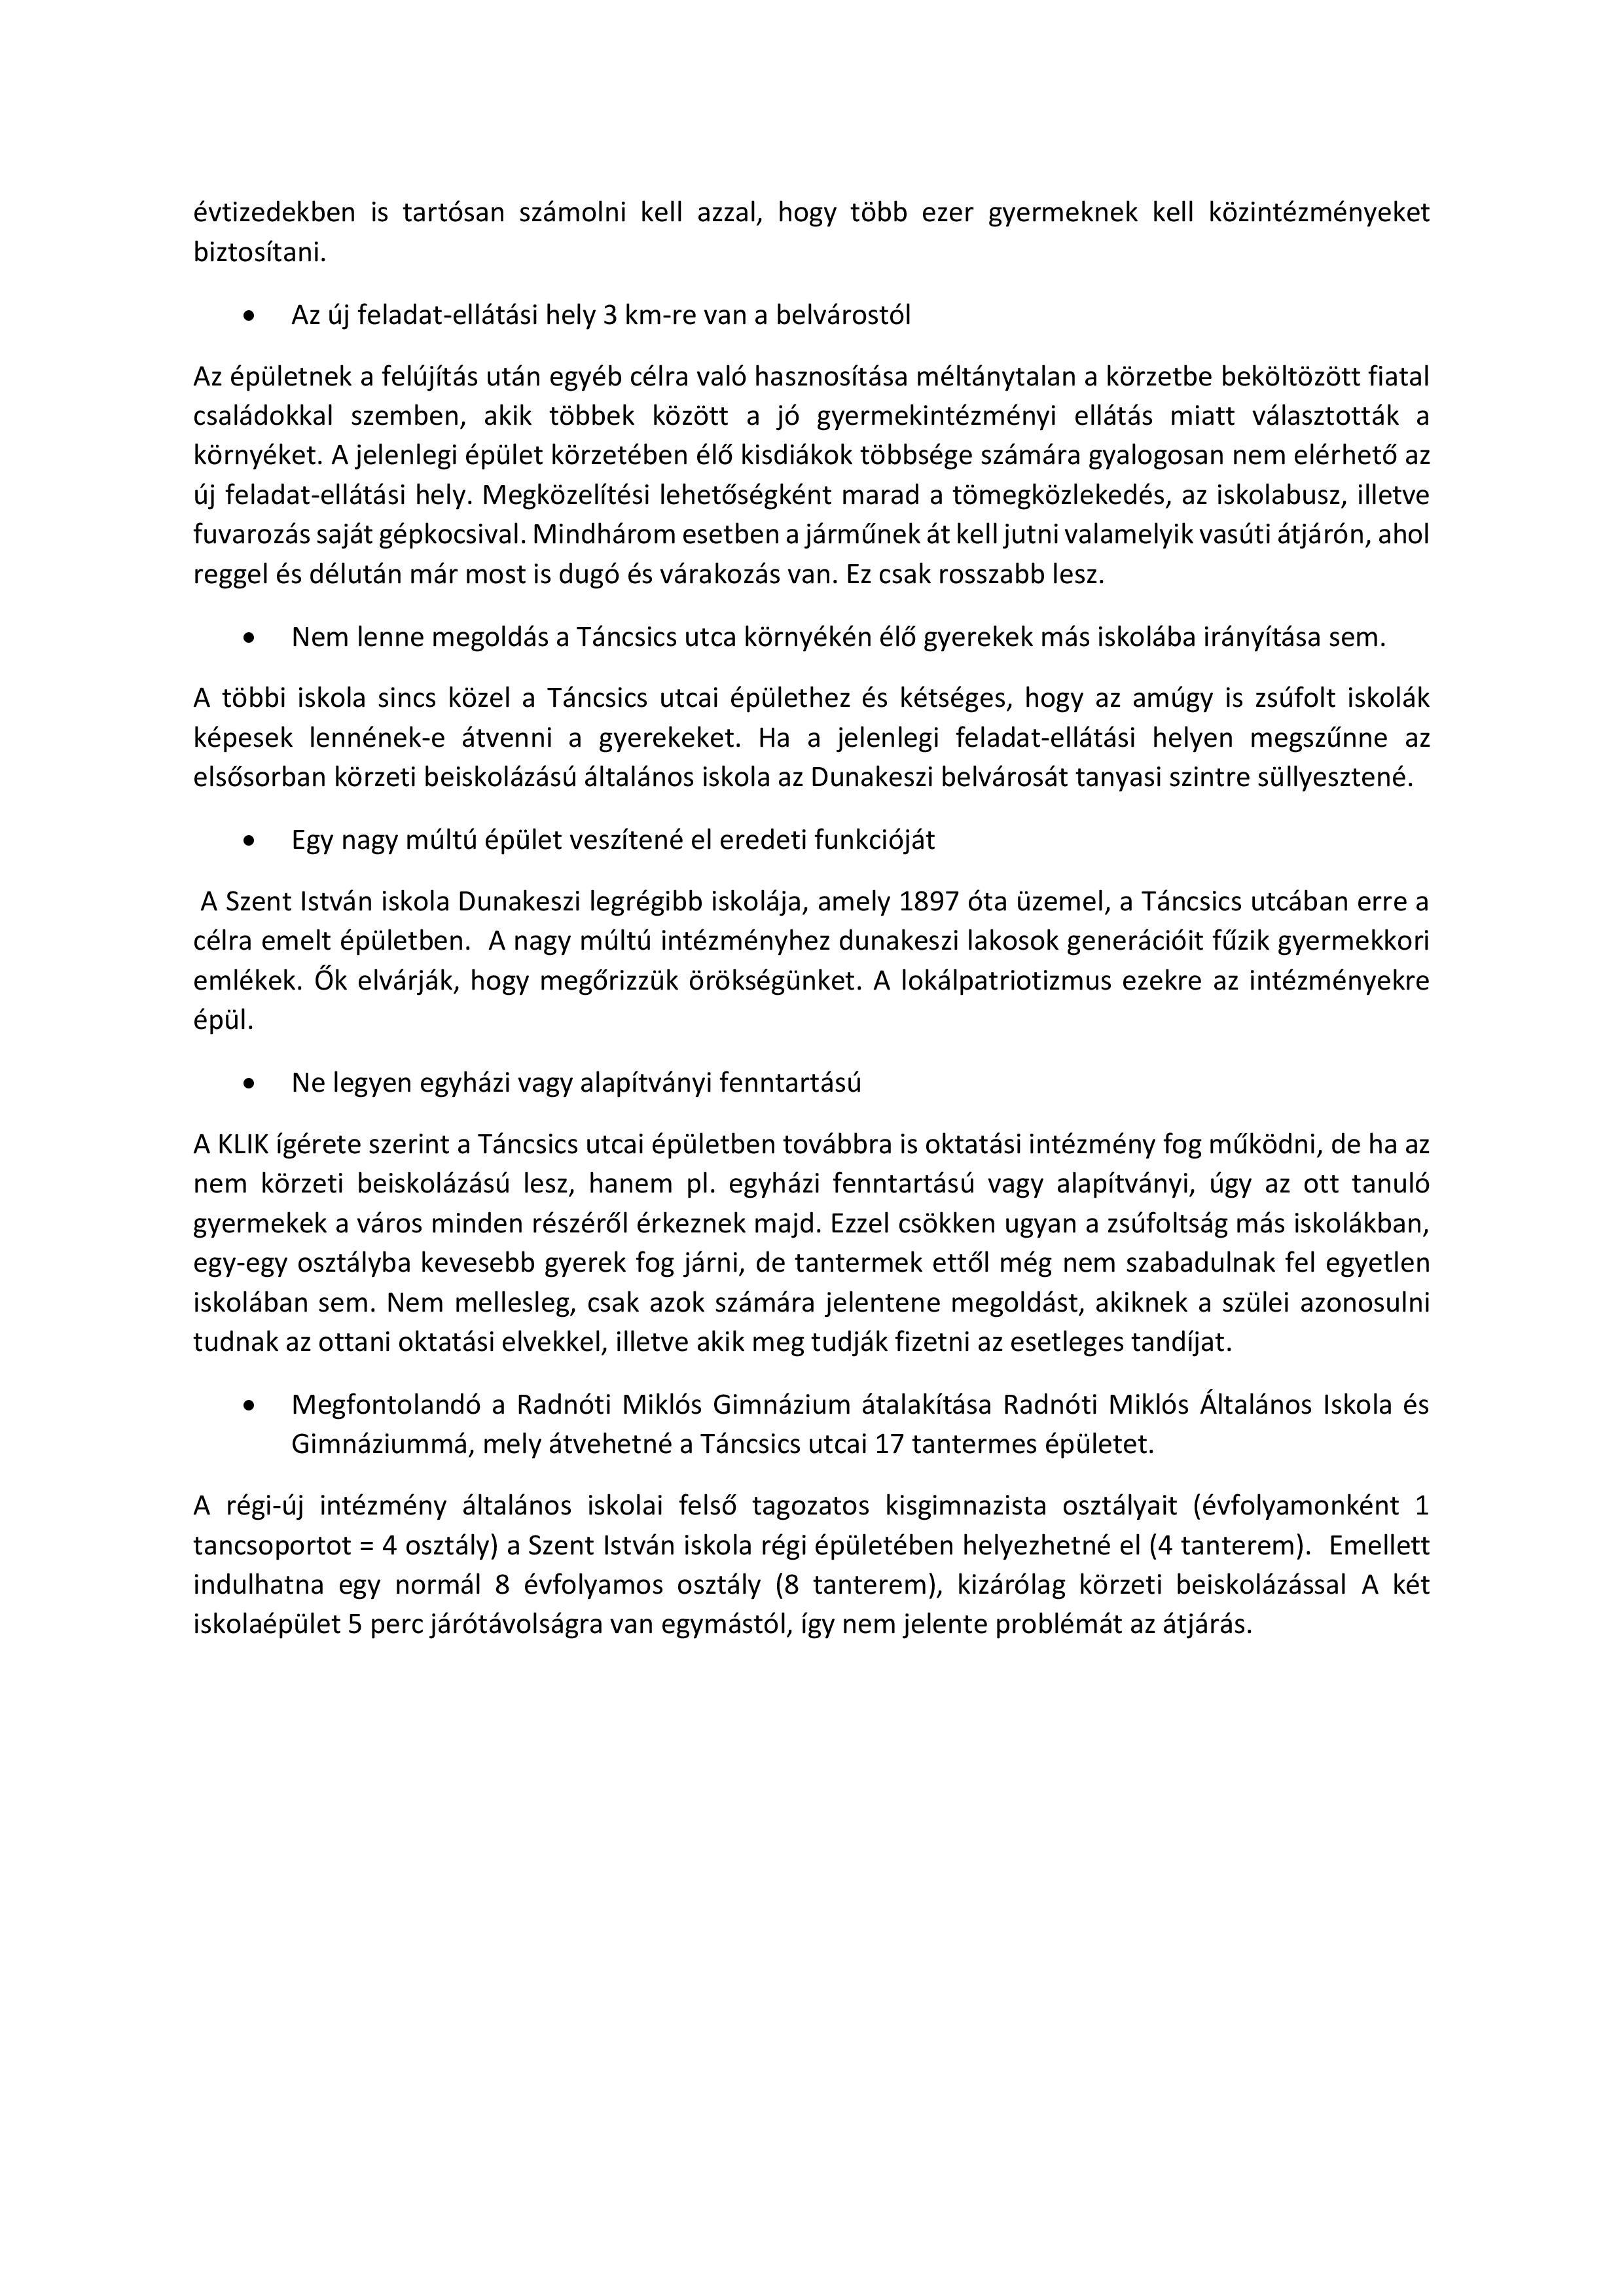 modosito_inditvany_a_dunakeszi_szent_istvan_altalanos_iskola_atszervezesenek_velemenyezese_cimu_napirendi_ponthoz1-page-002.jpg